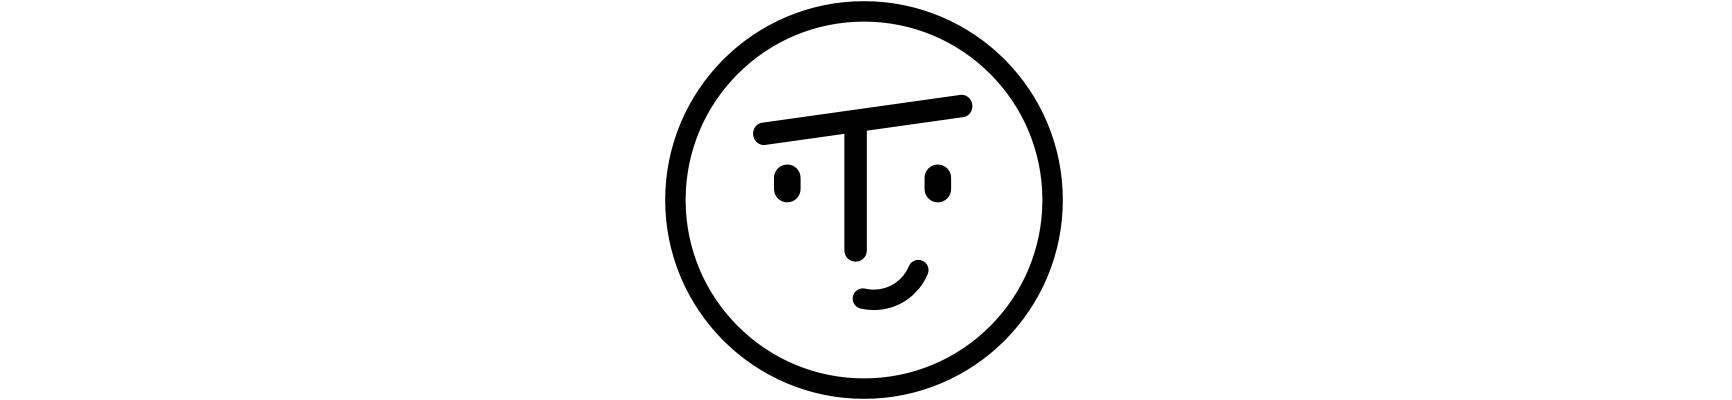 poli icon.jpg